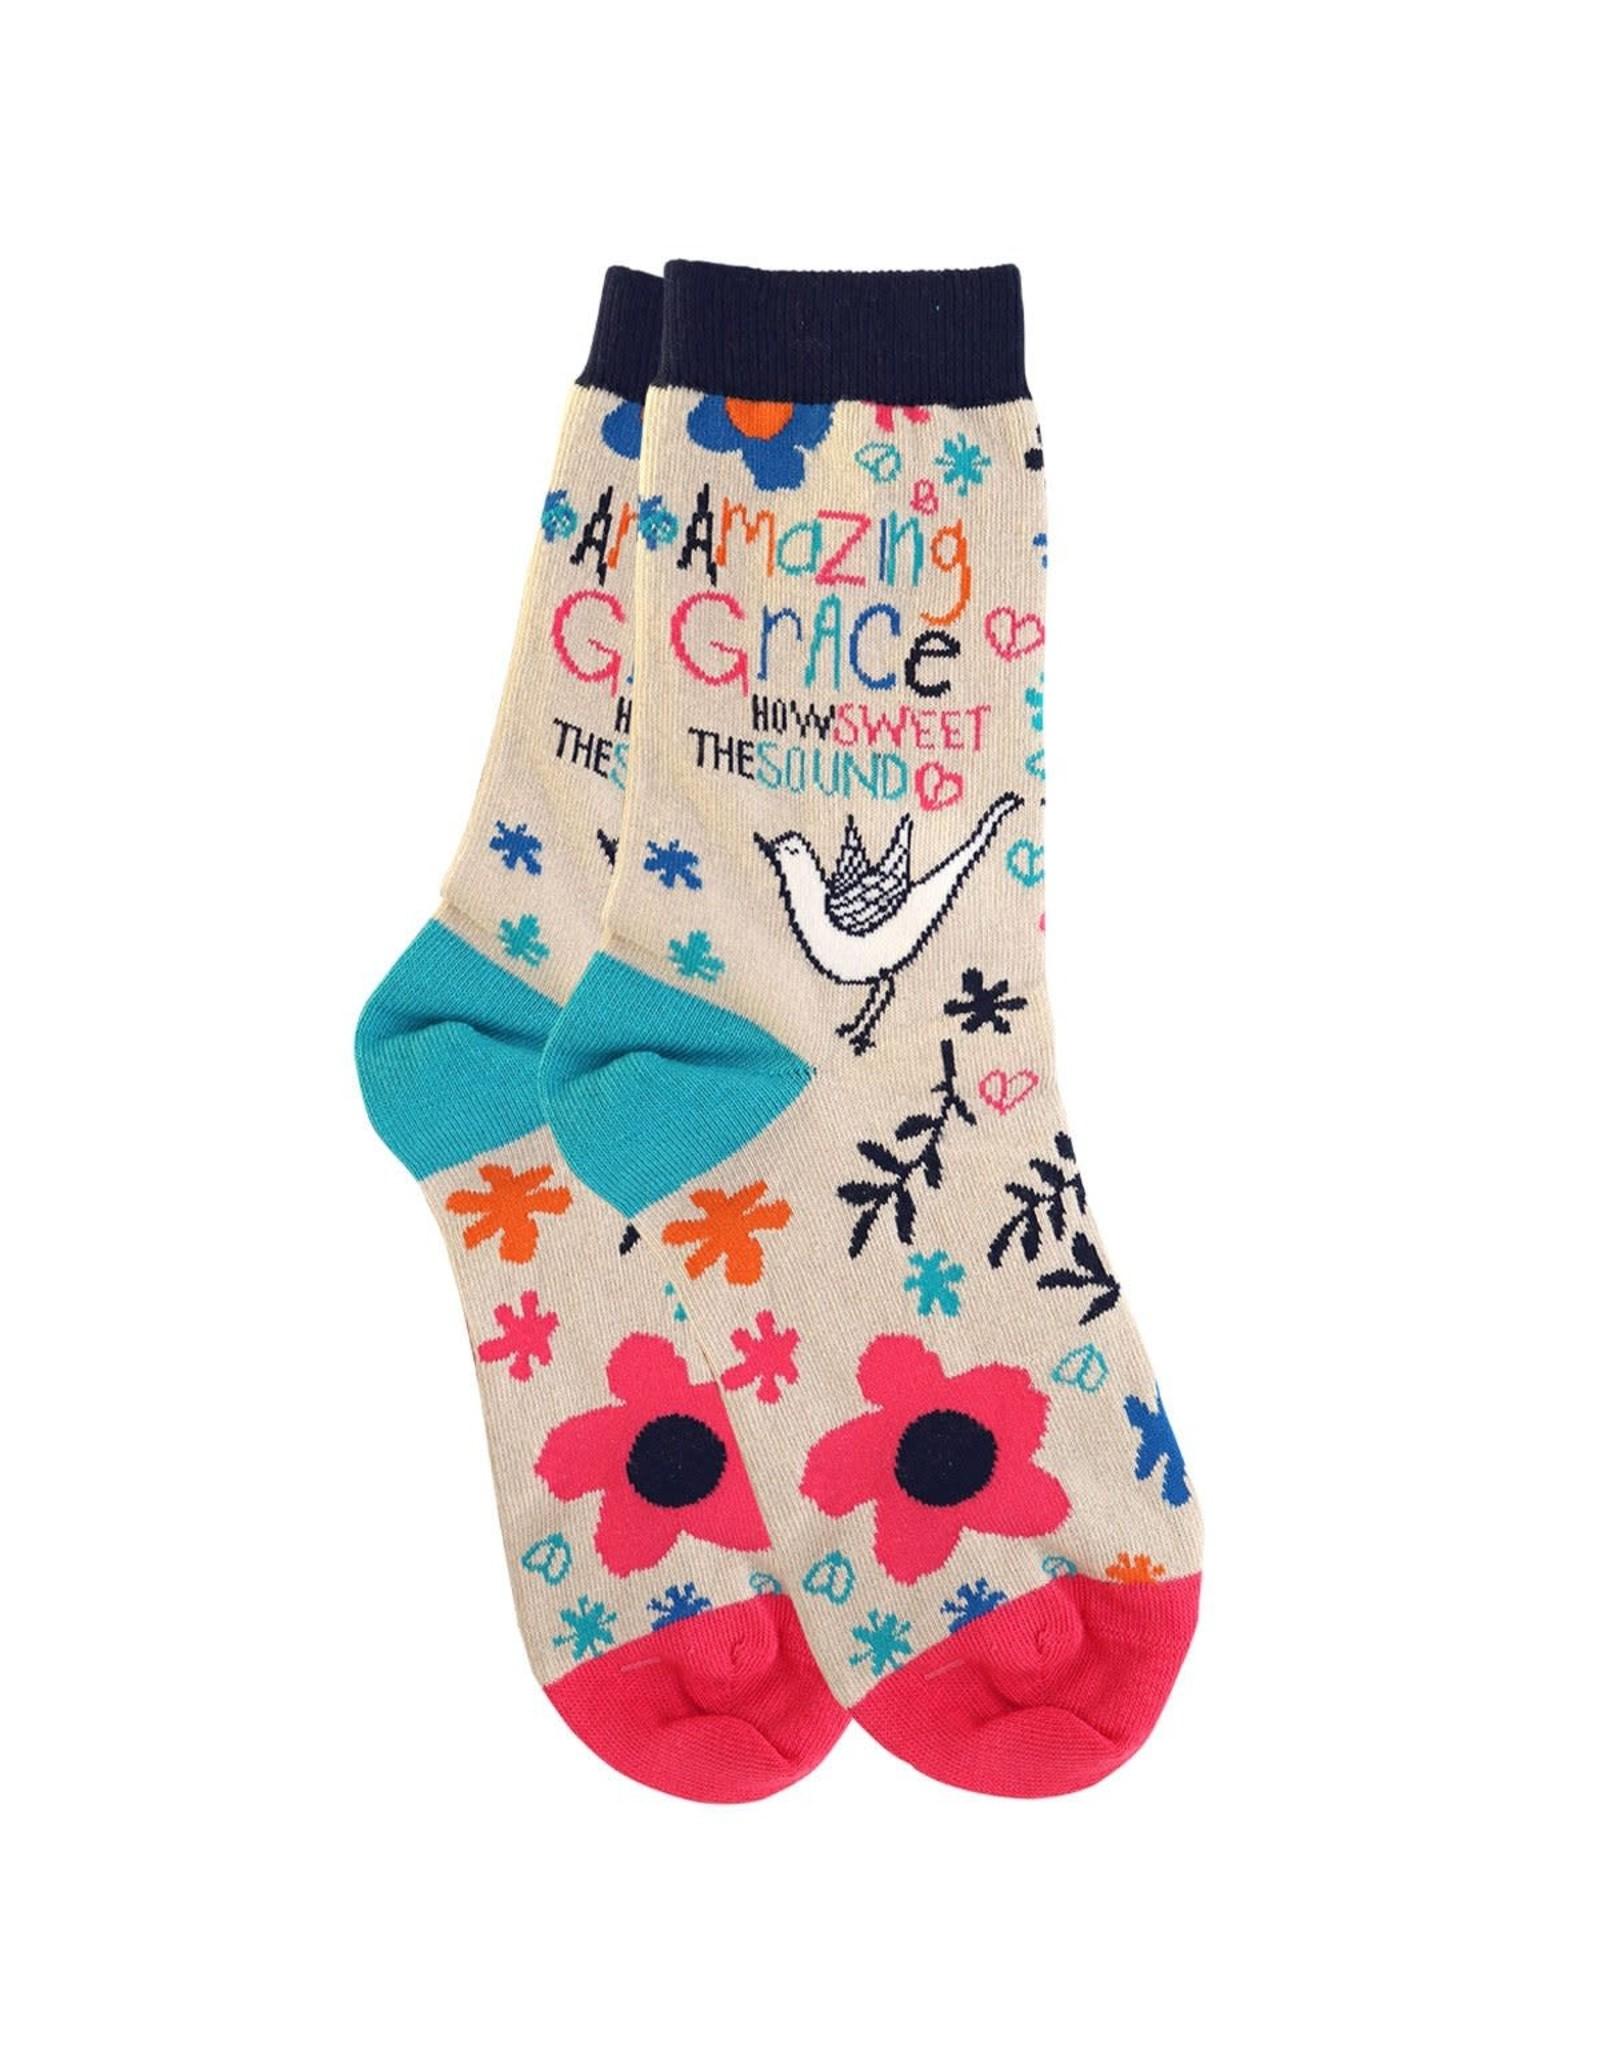 Bless My Sole Socks - Amazing Grace, Bird